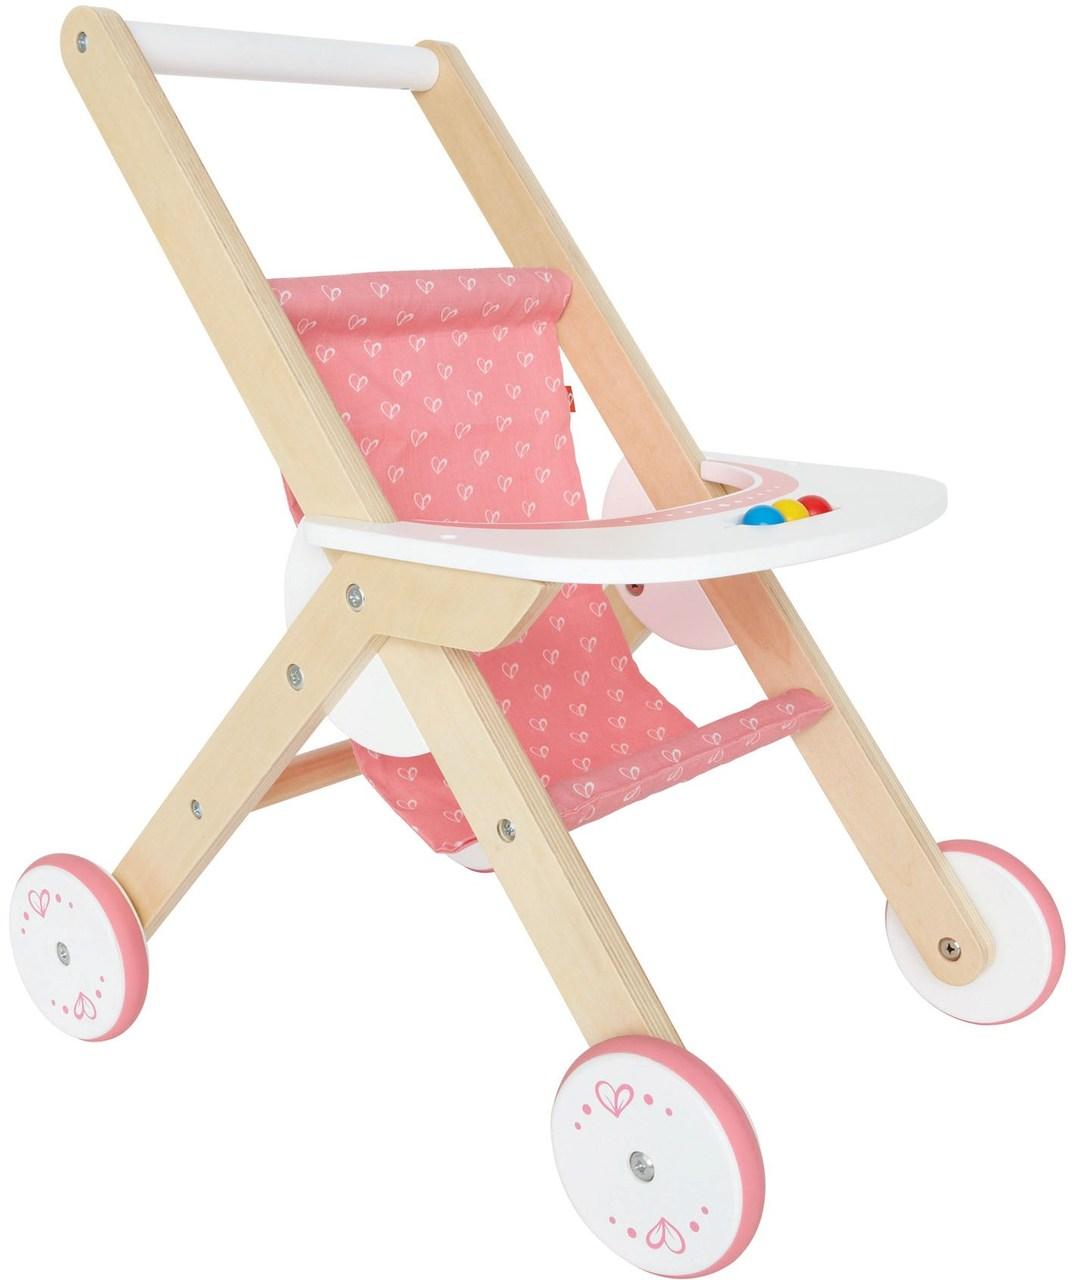 Hape Wooden Baby Doll Pram on Sale! | Play Dolls & Baby ...